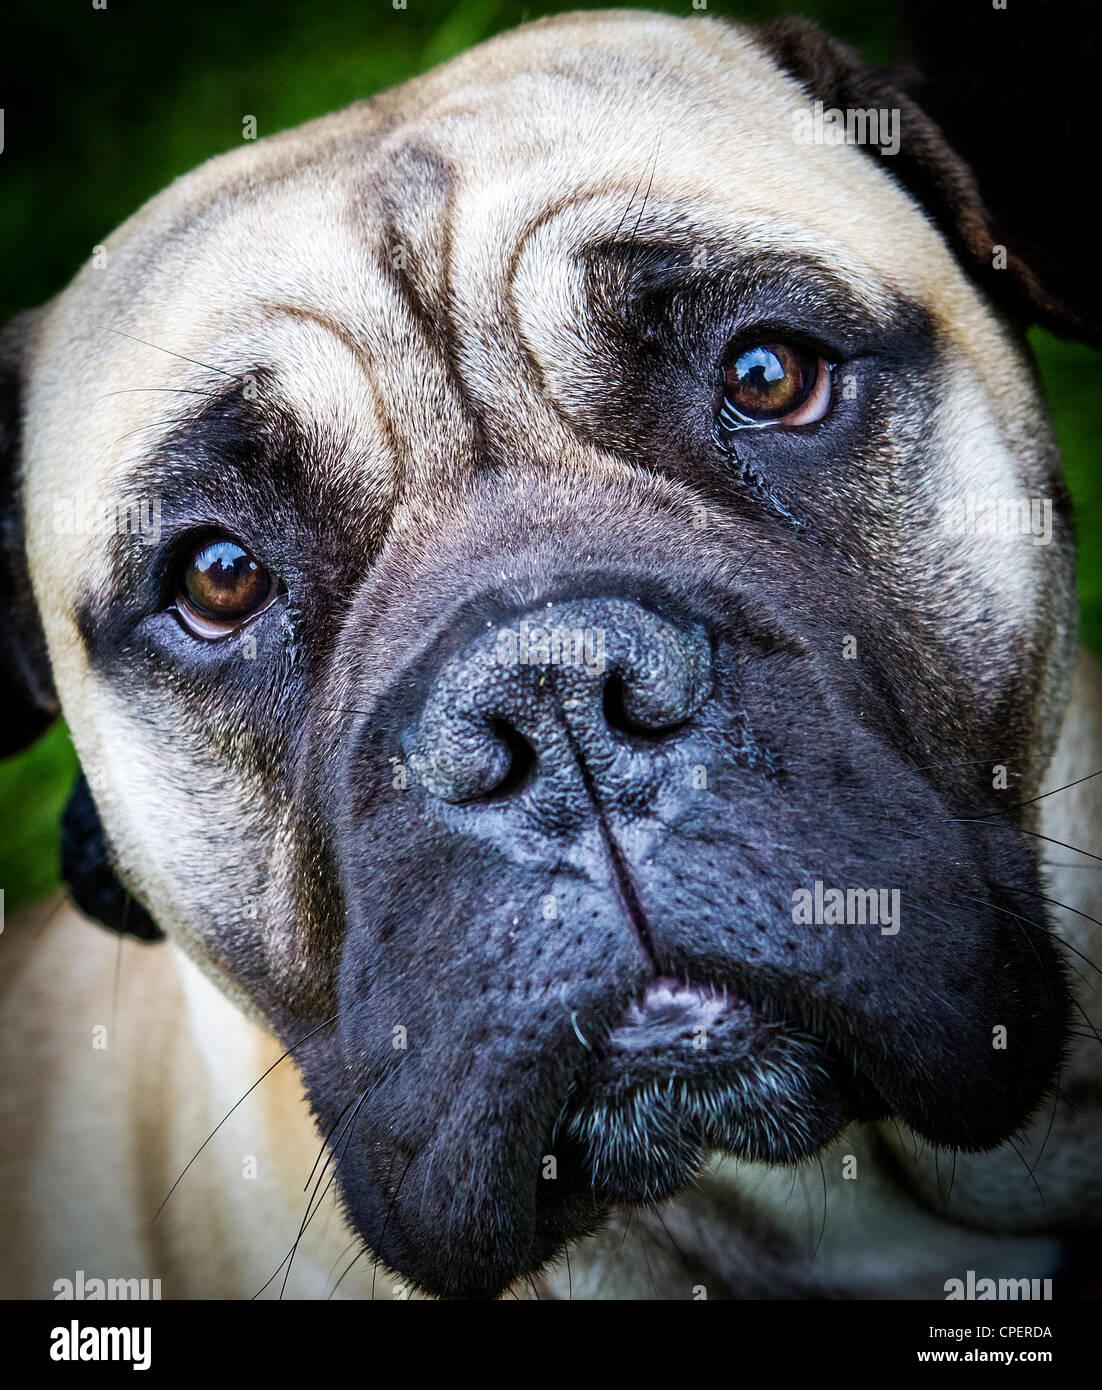 Close up of a Bullmastiff dog's face - Stock Image